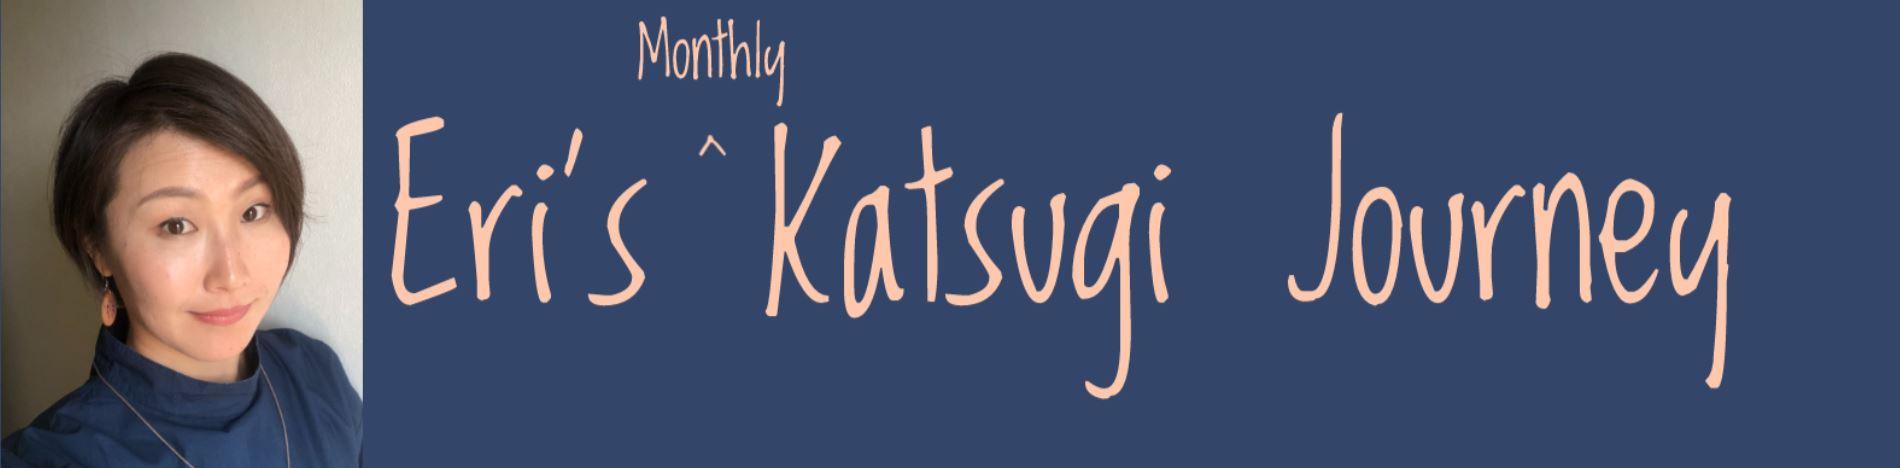 Eri's Monthly Katsugi Journey Banner